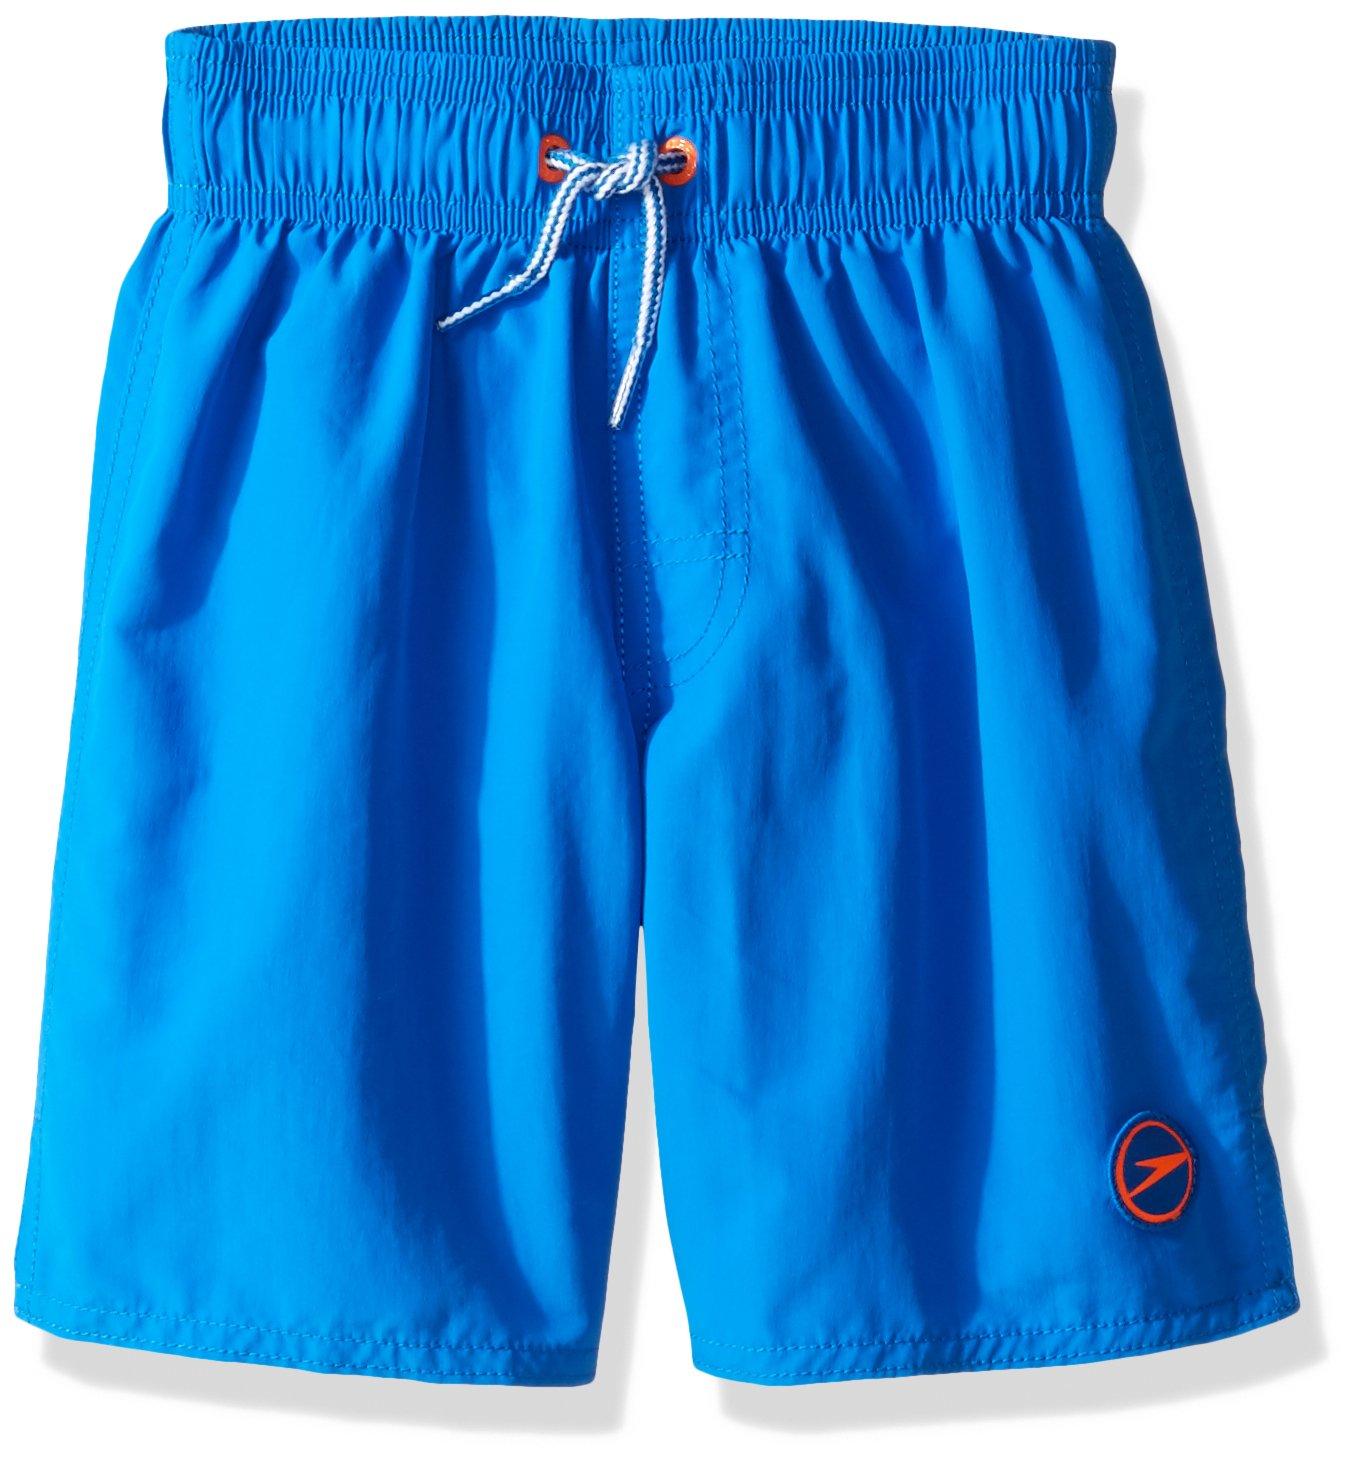 Speedo Boys Sun Ray Volley Short Swim Trunk Speedo Children's Apparel 7747009-P